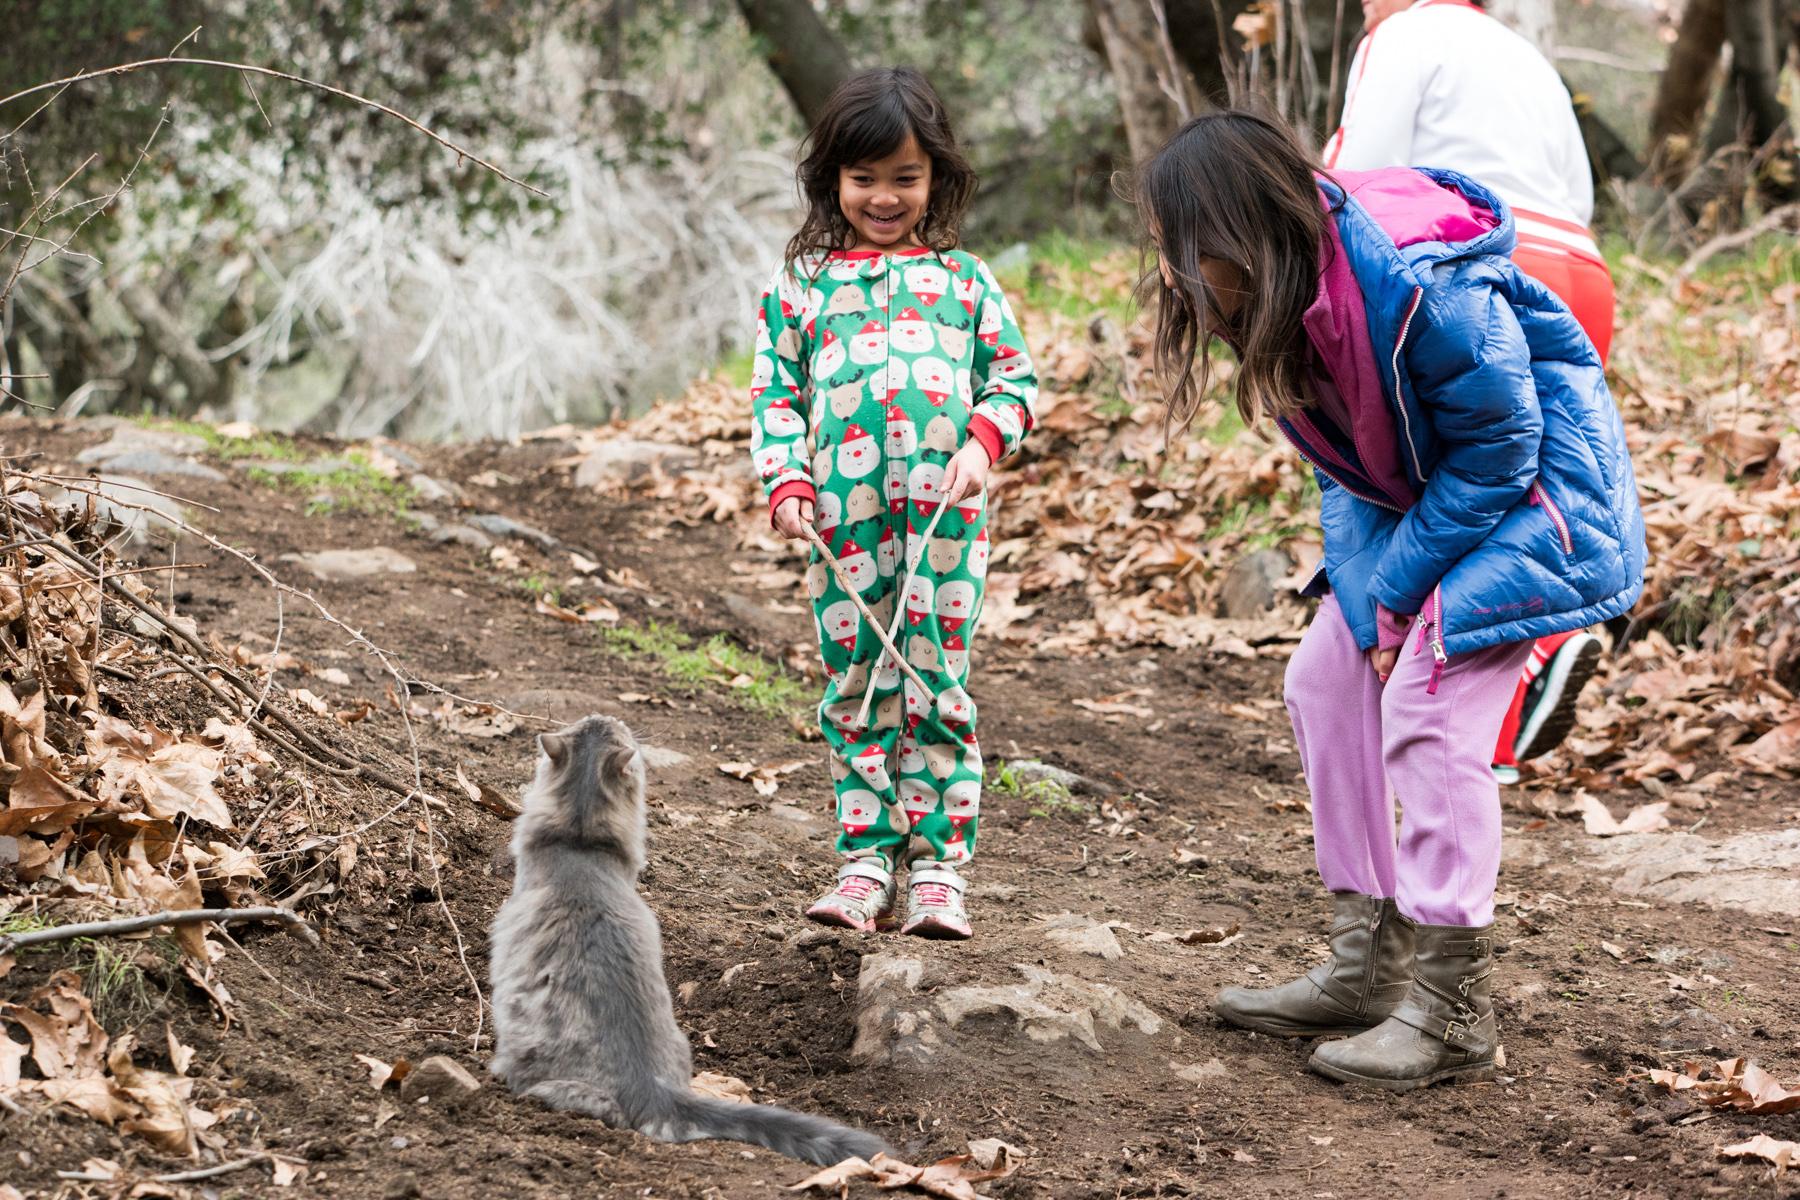 Wasim Muklashy Photography_Sequoia National Park_California_December 2015_-SAM_4230.jpg